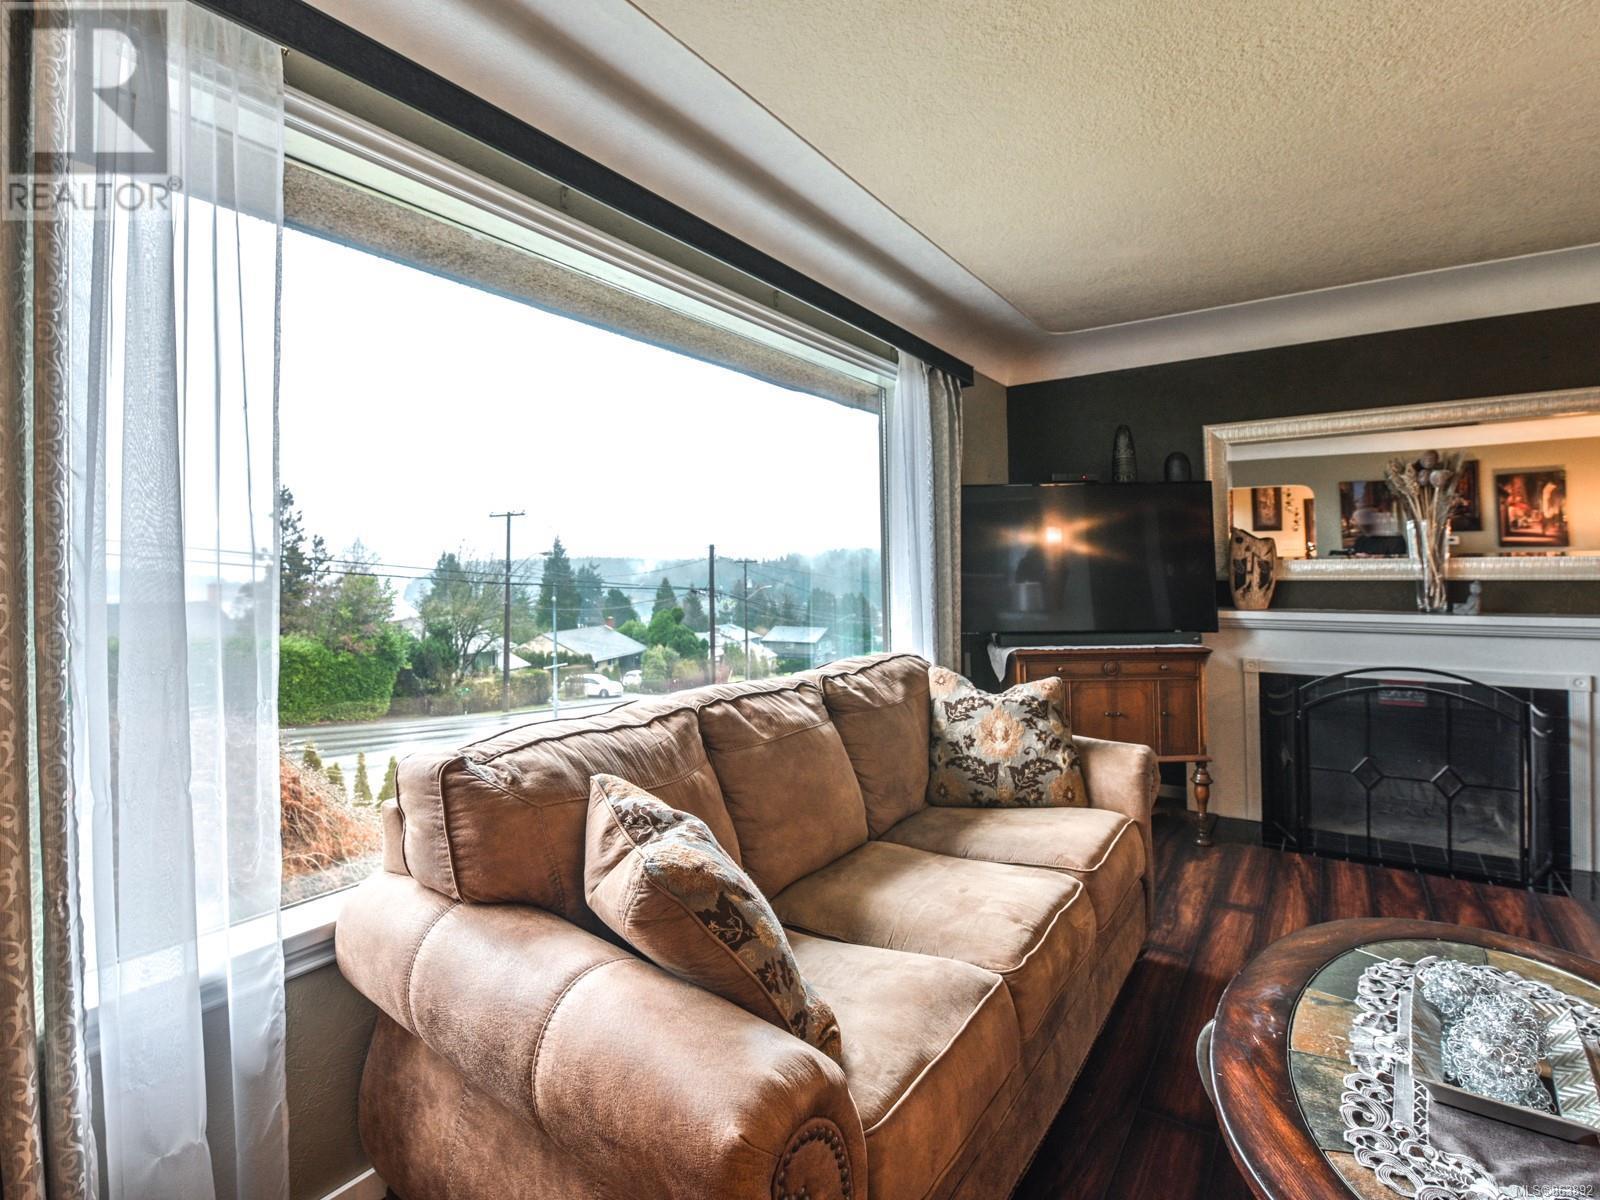 935 Brechin Rd, Nanaimo, British Columbia  V9S 2X5 - Photo 22 - 863892